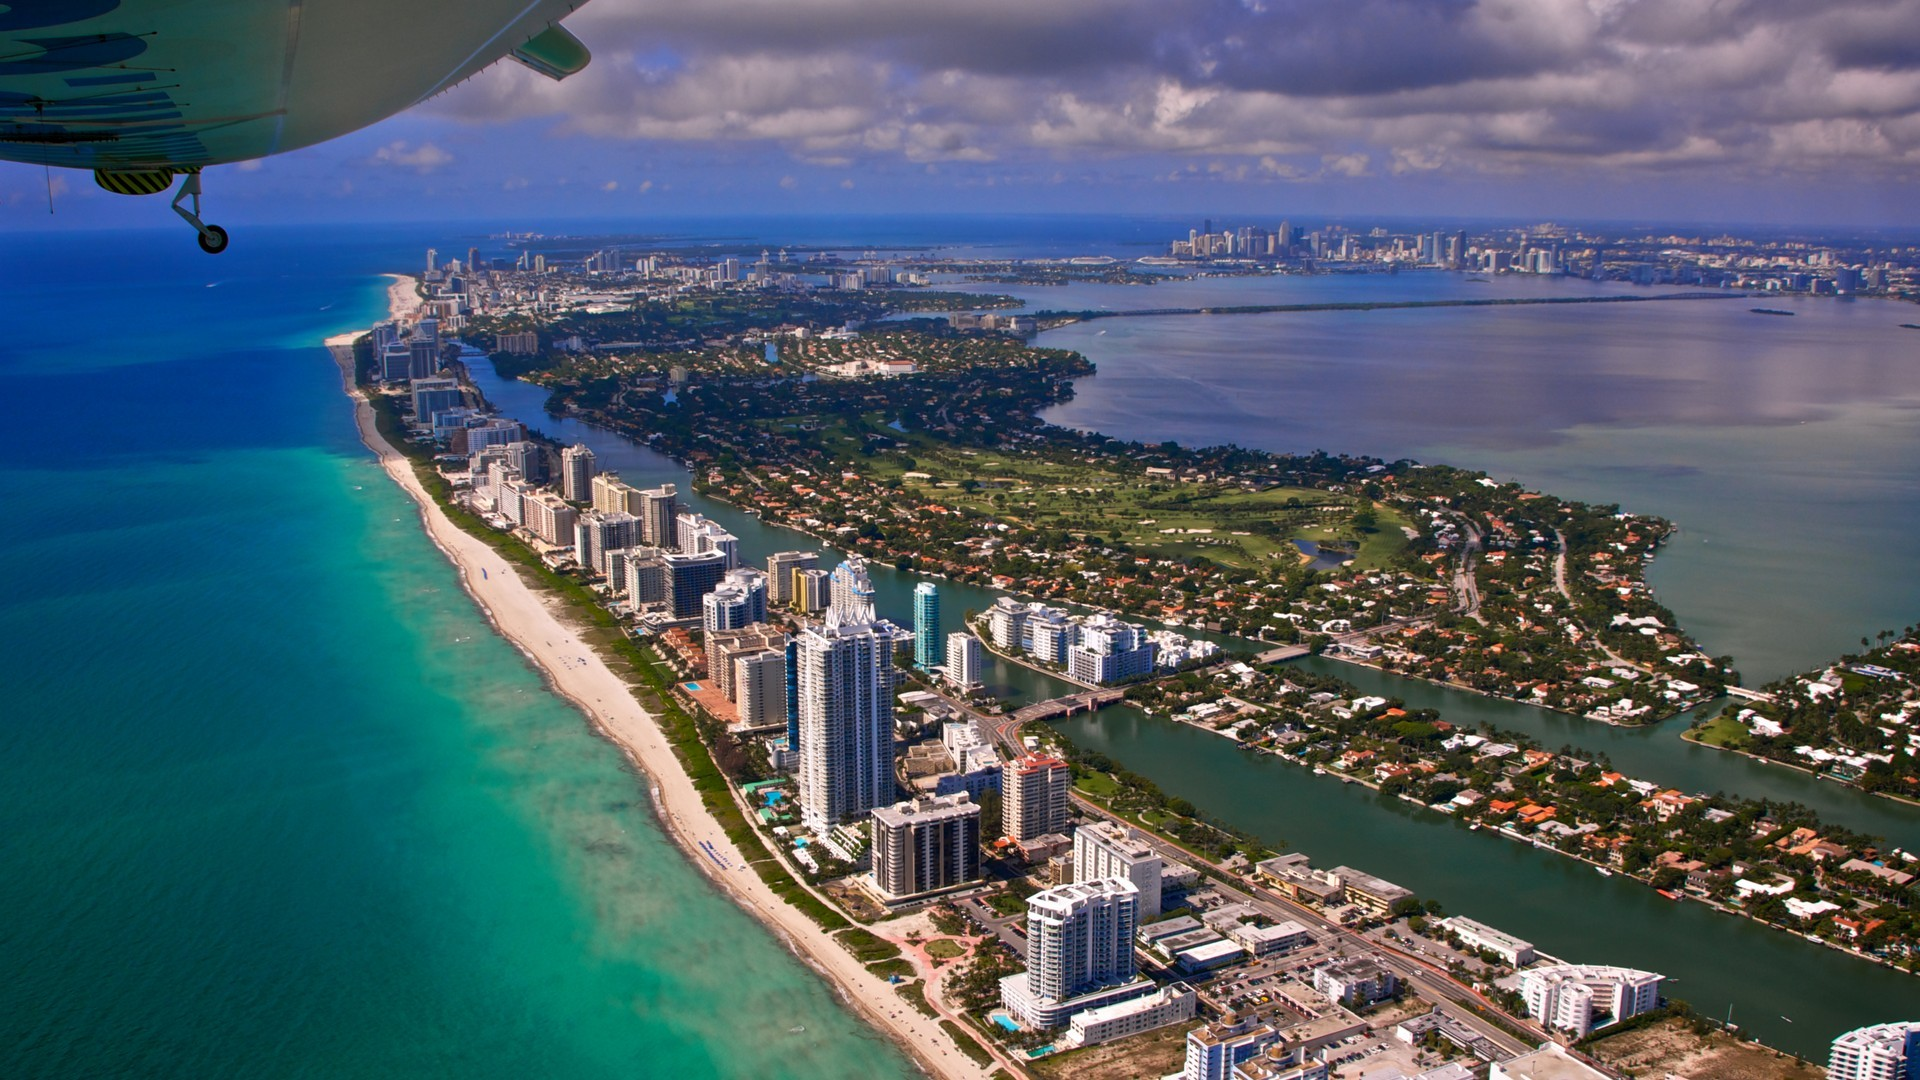 Free Download Miami Florida 1920x1080 Full Hd Wallpaper